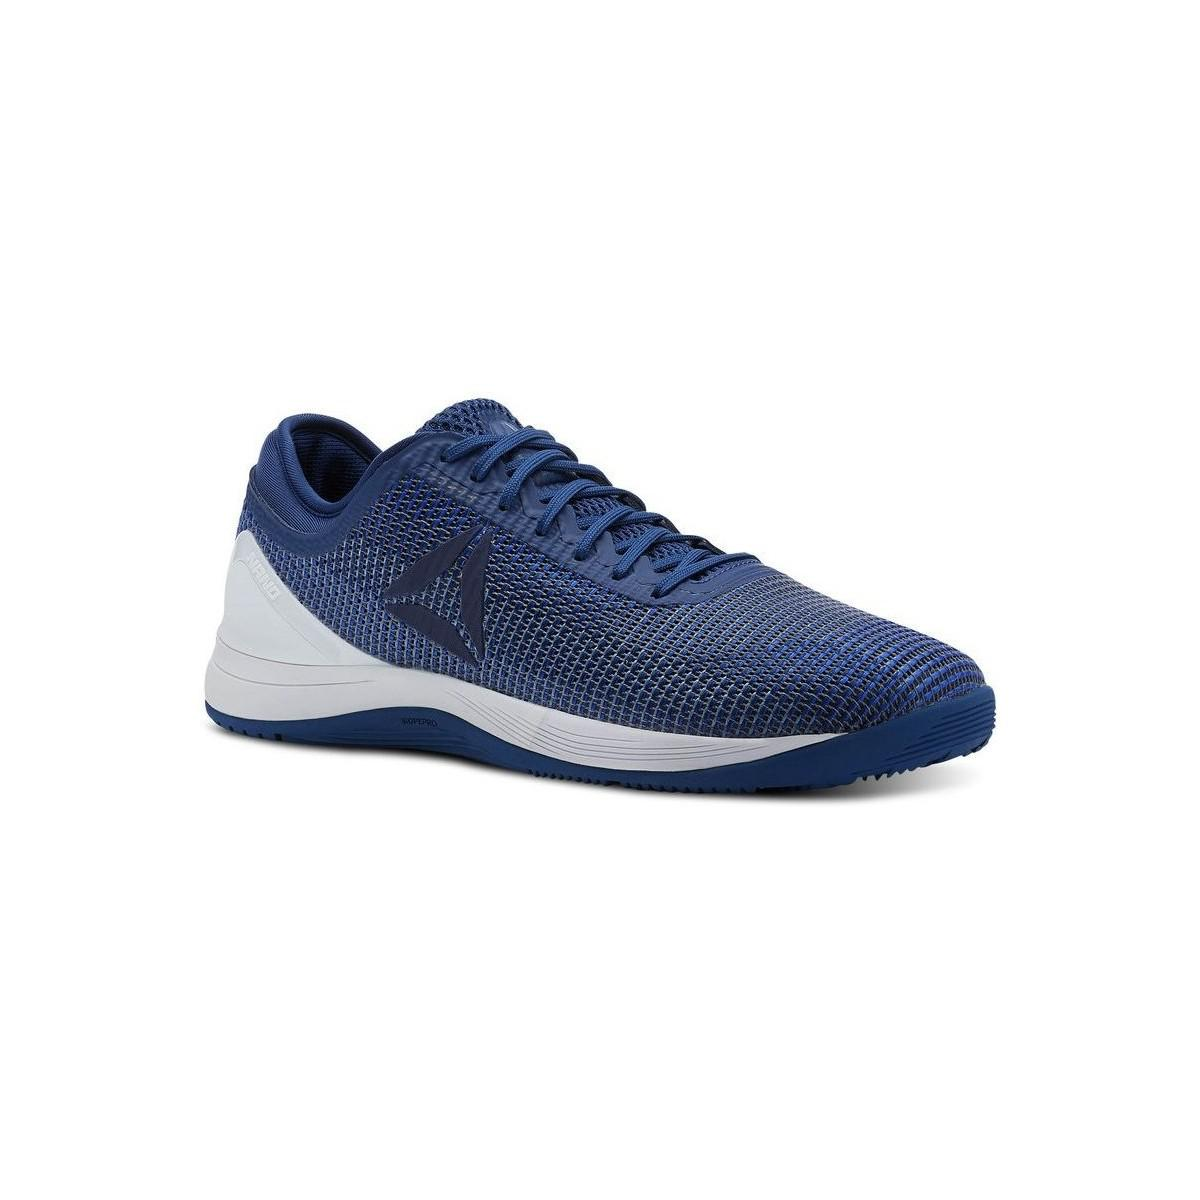 Reebok R Crossfit Nano 80 Men's Shoes (trainers) In